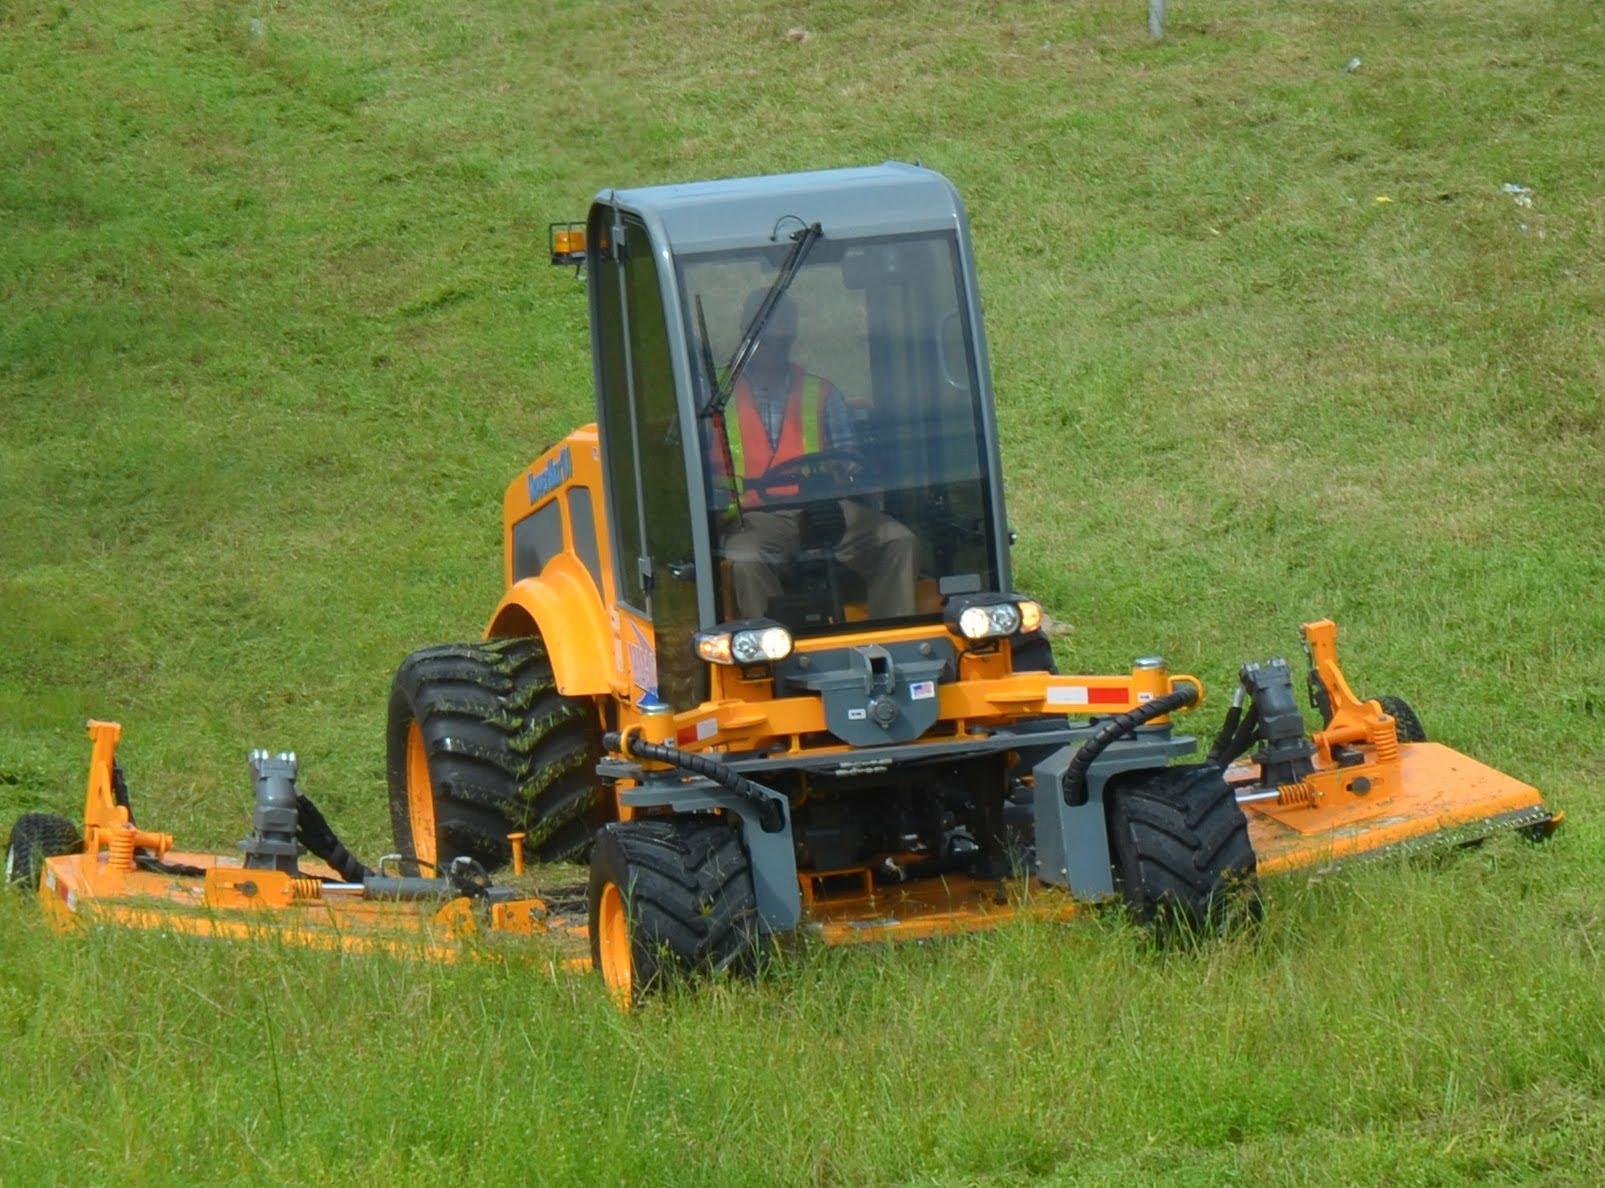 2012 MowerMax - Heavy Duty Industrial Wide Area Mower ...